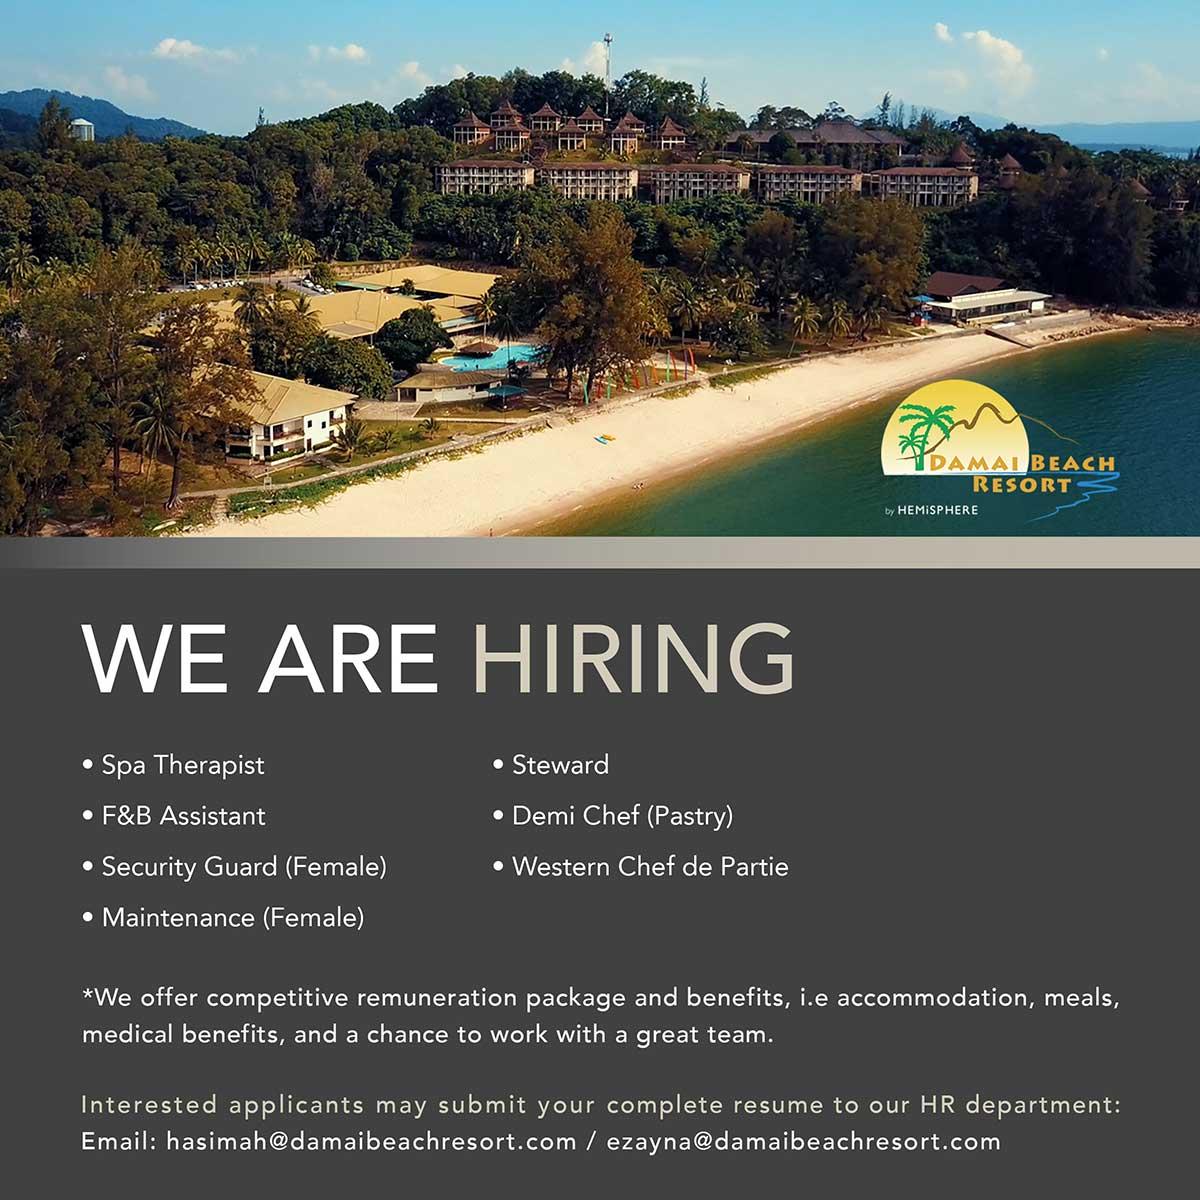 Damai Beach Resort Careers